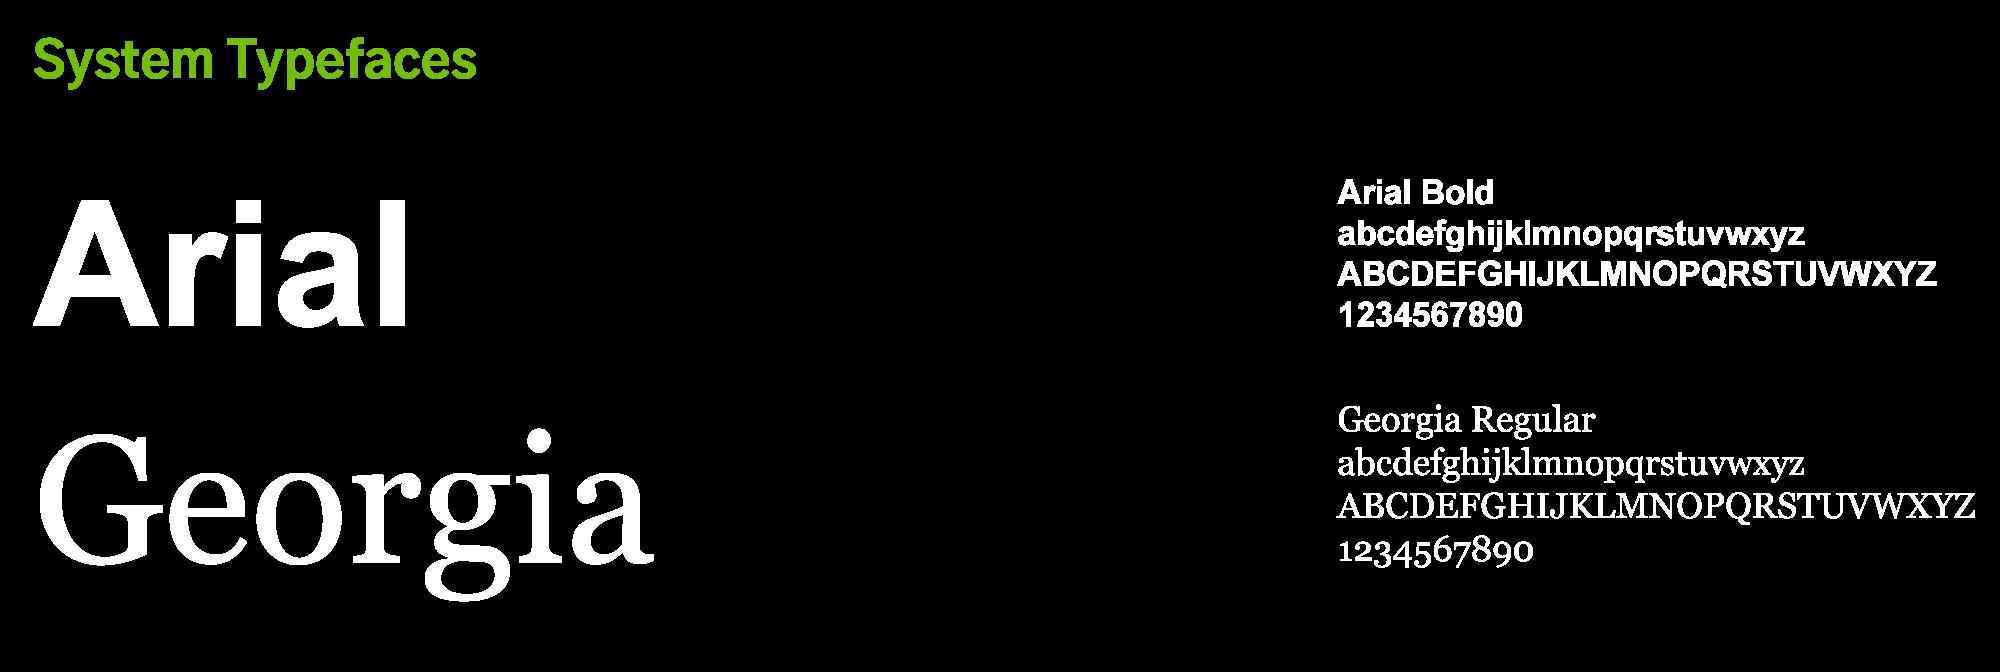 type-system